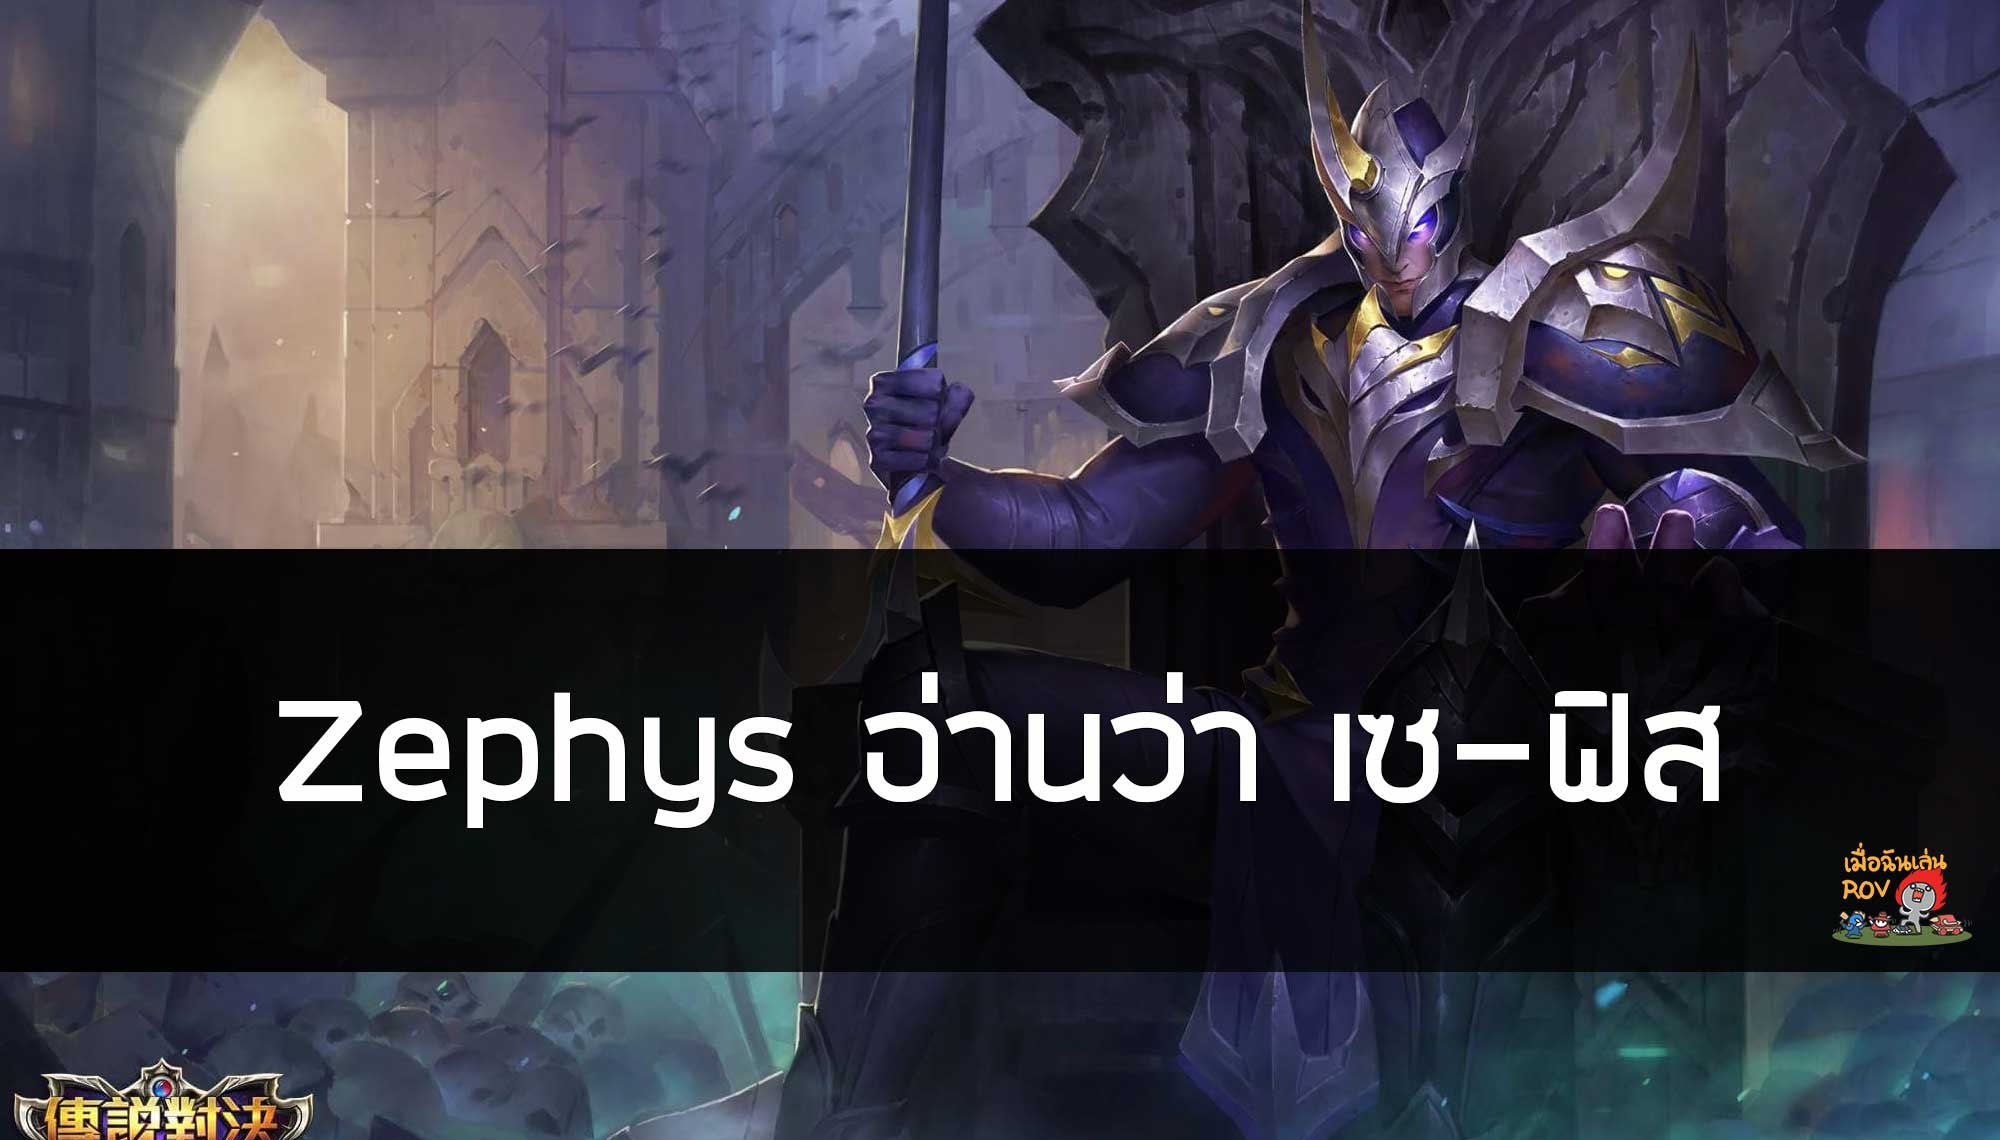 Zephys อ่านว่า เซ-ฟิส